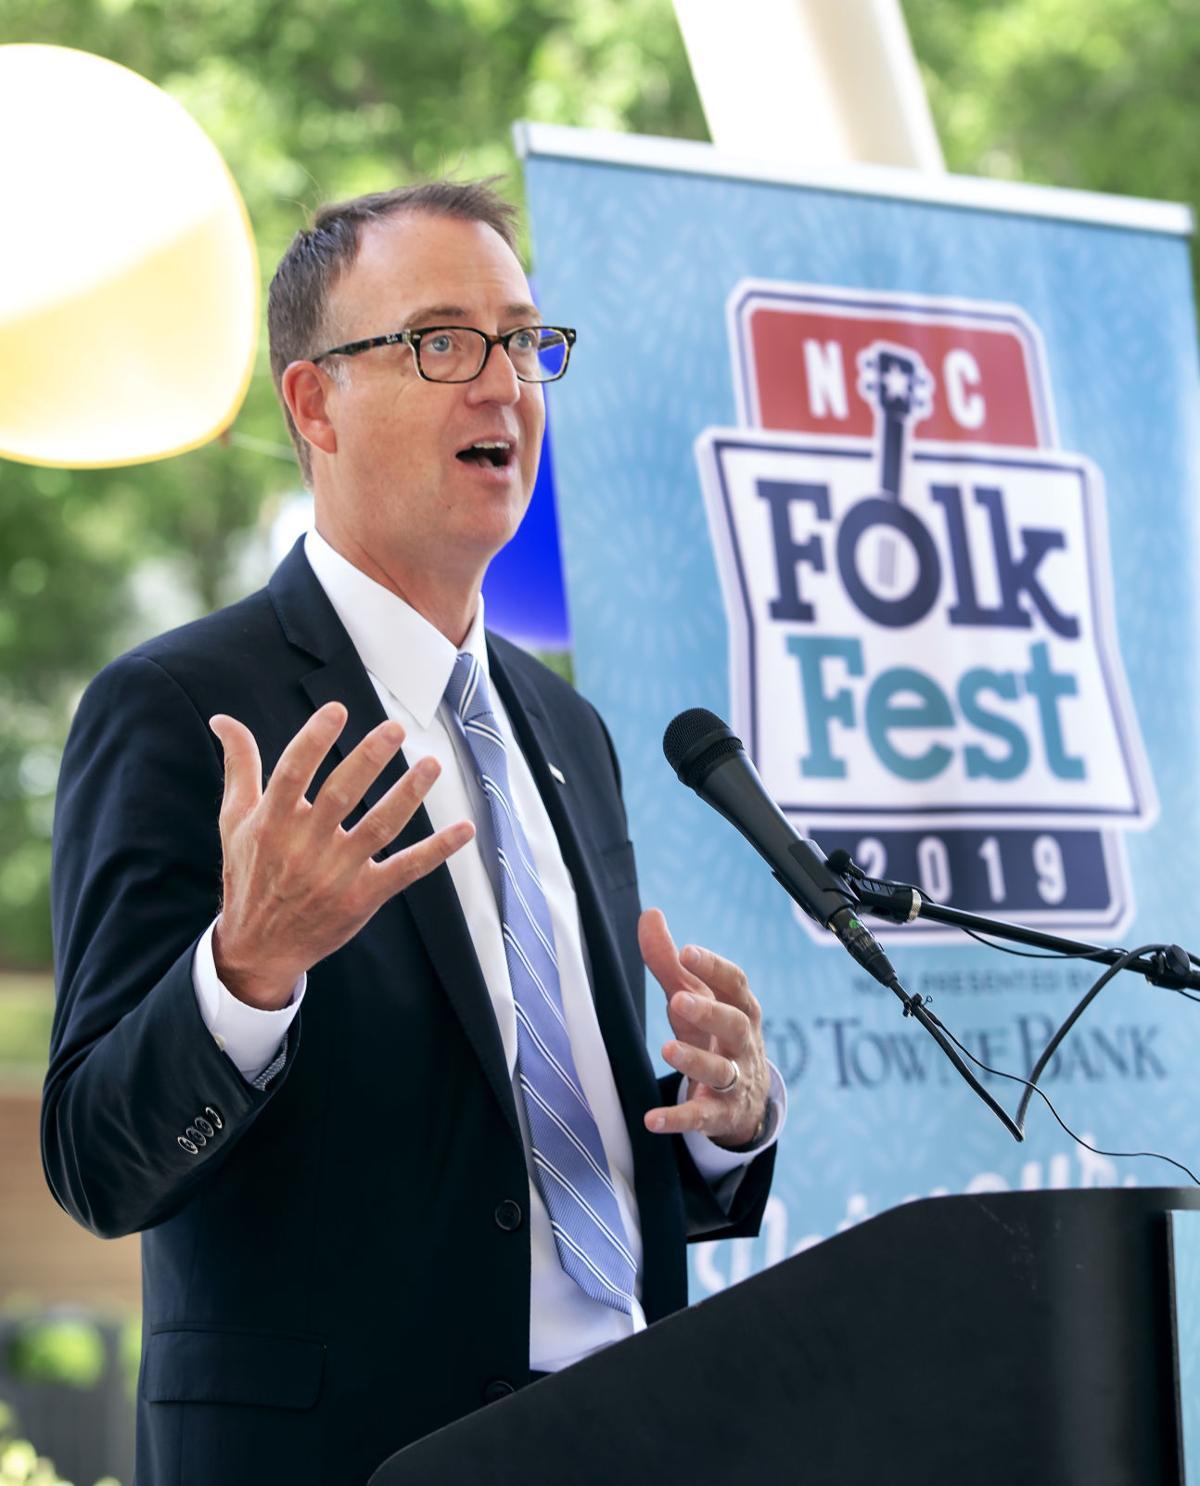 NC Folk Festival names presenting sponsor